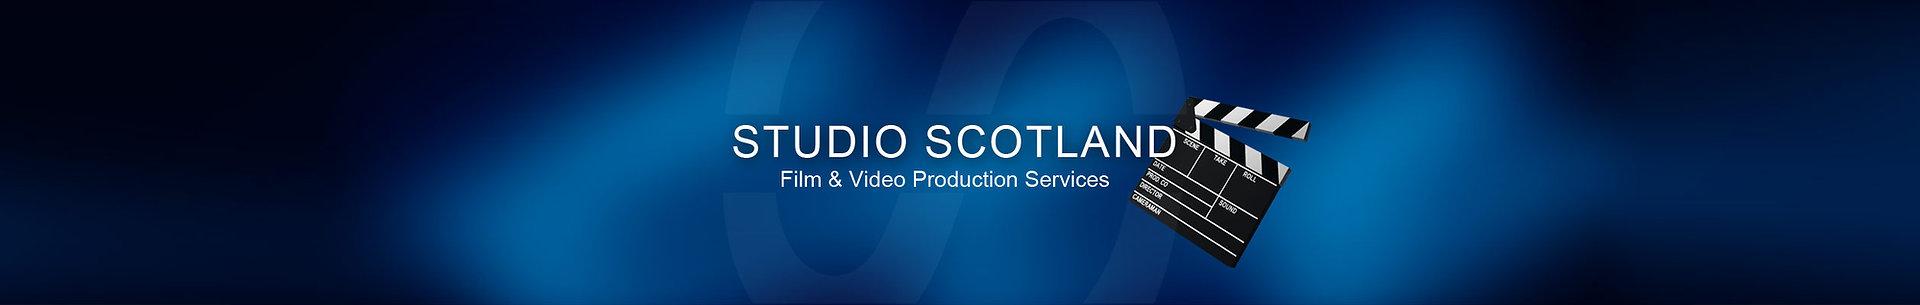 Studio Scotland banner